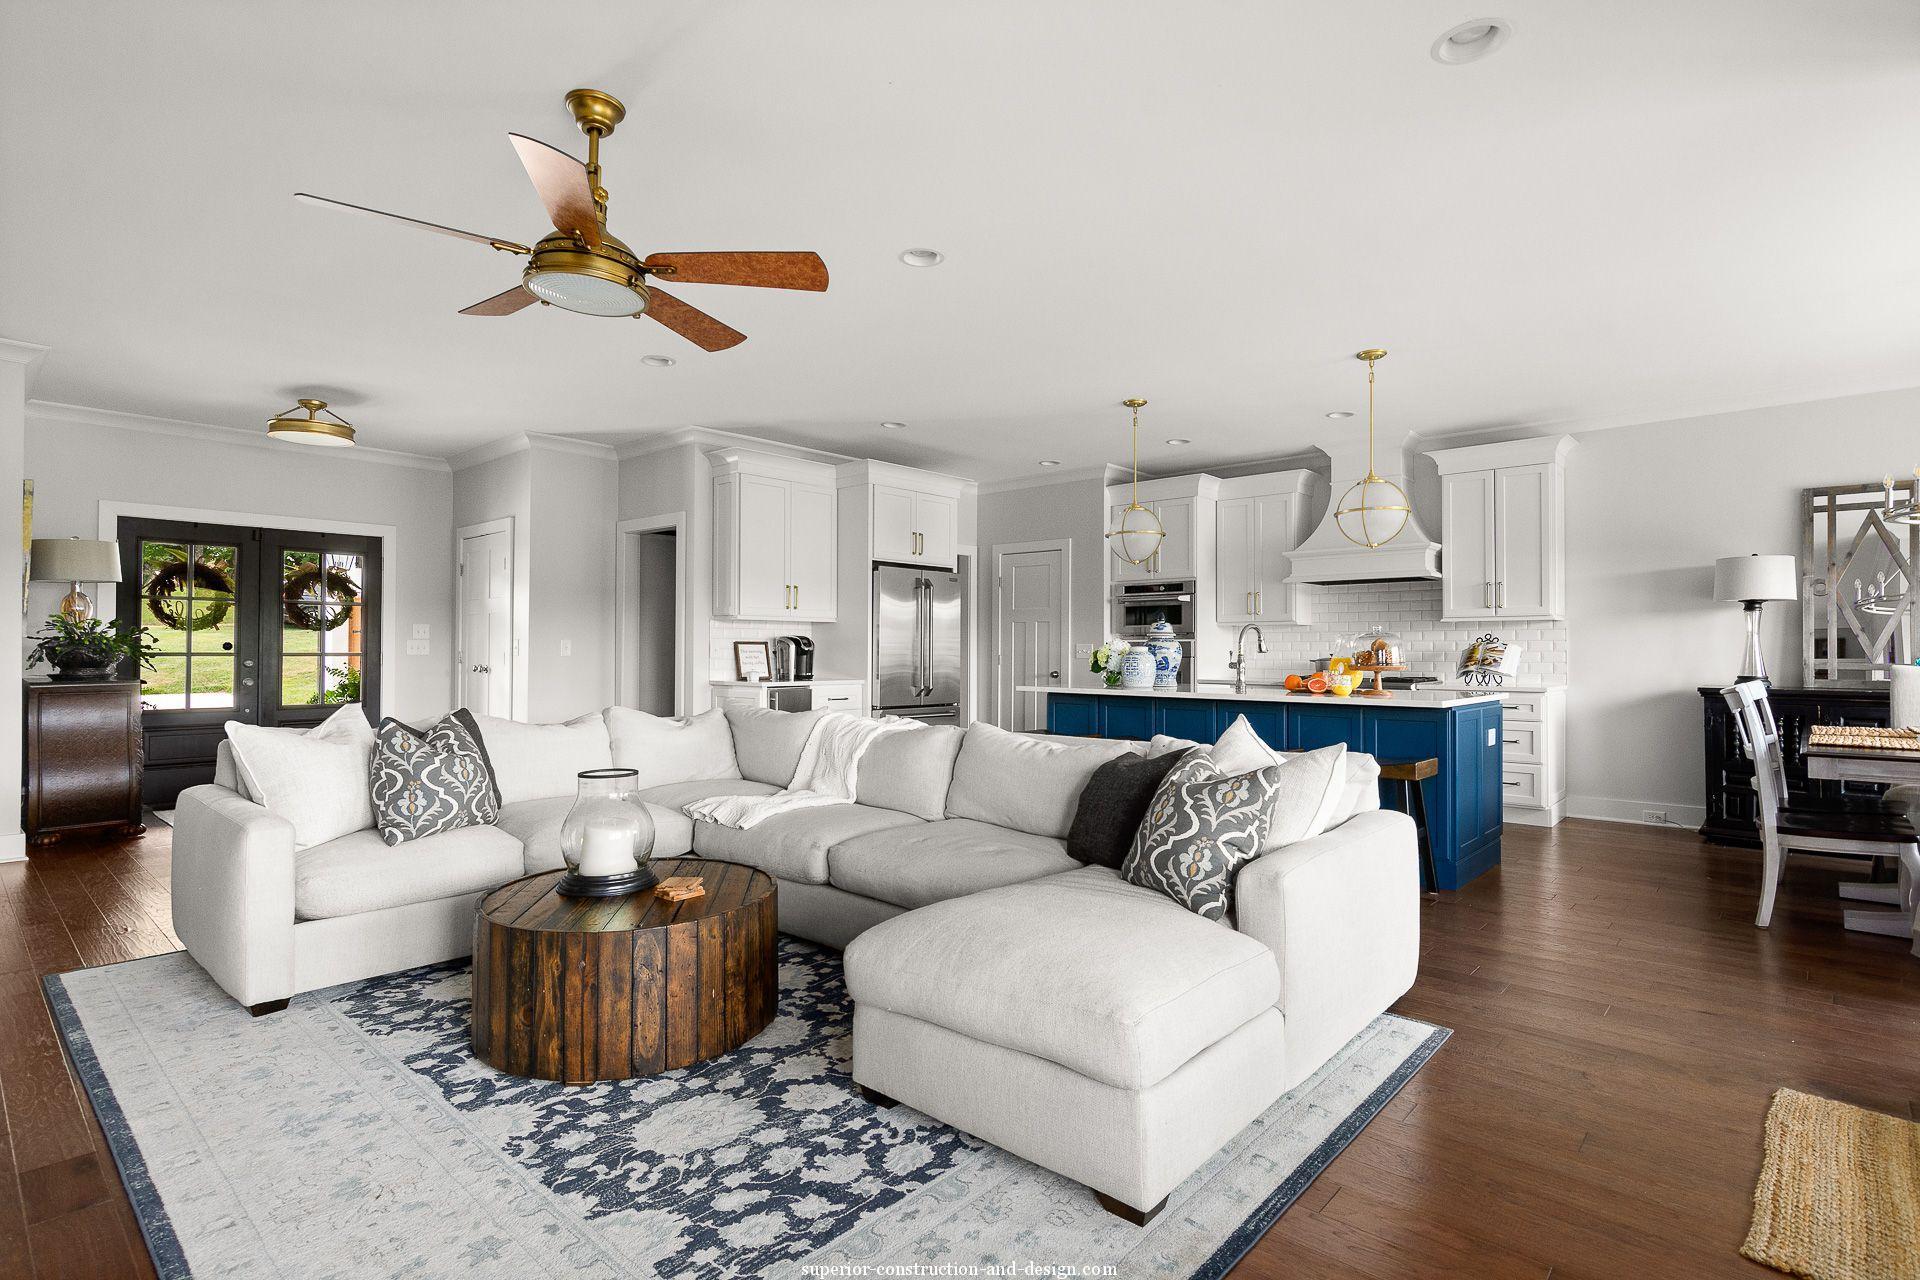 interior design new build lake home tour GC ID bright white traditional fresh blue island